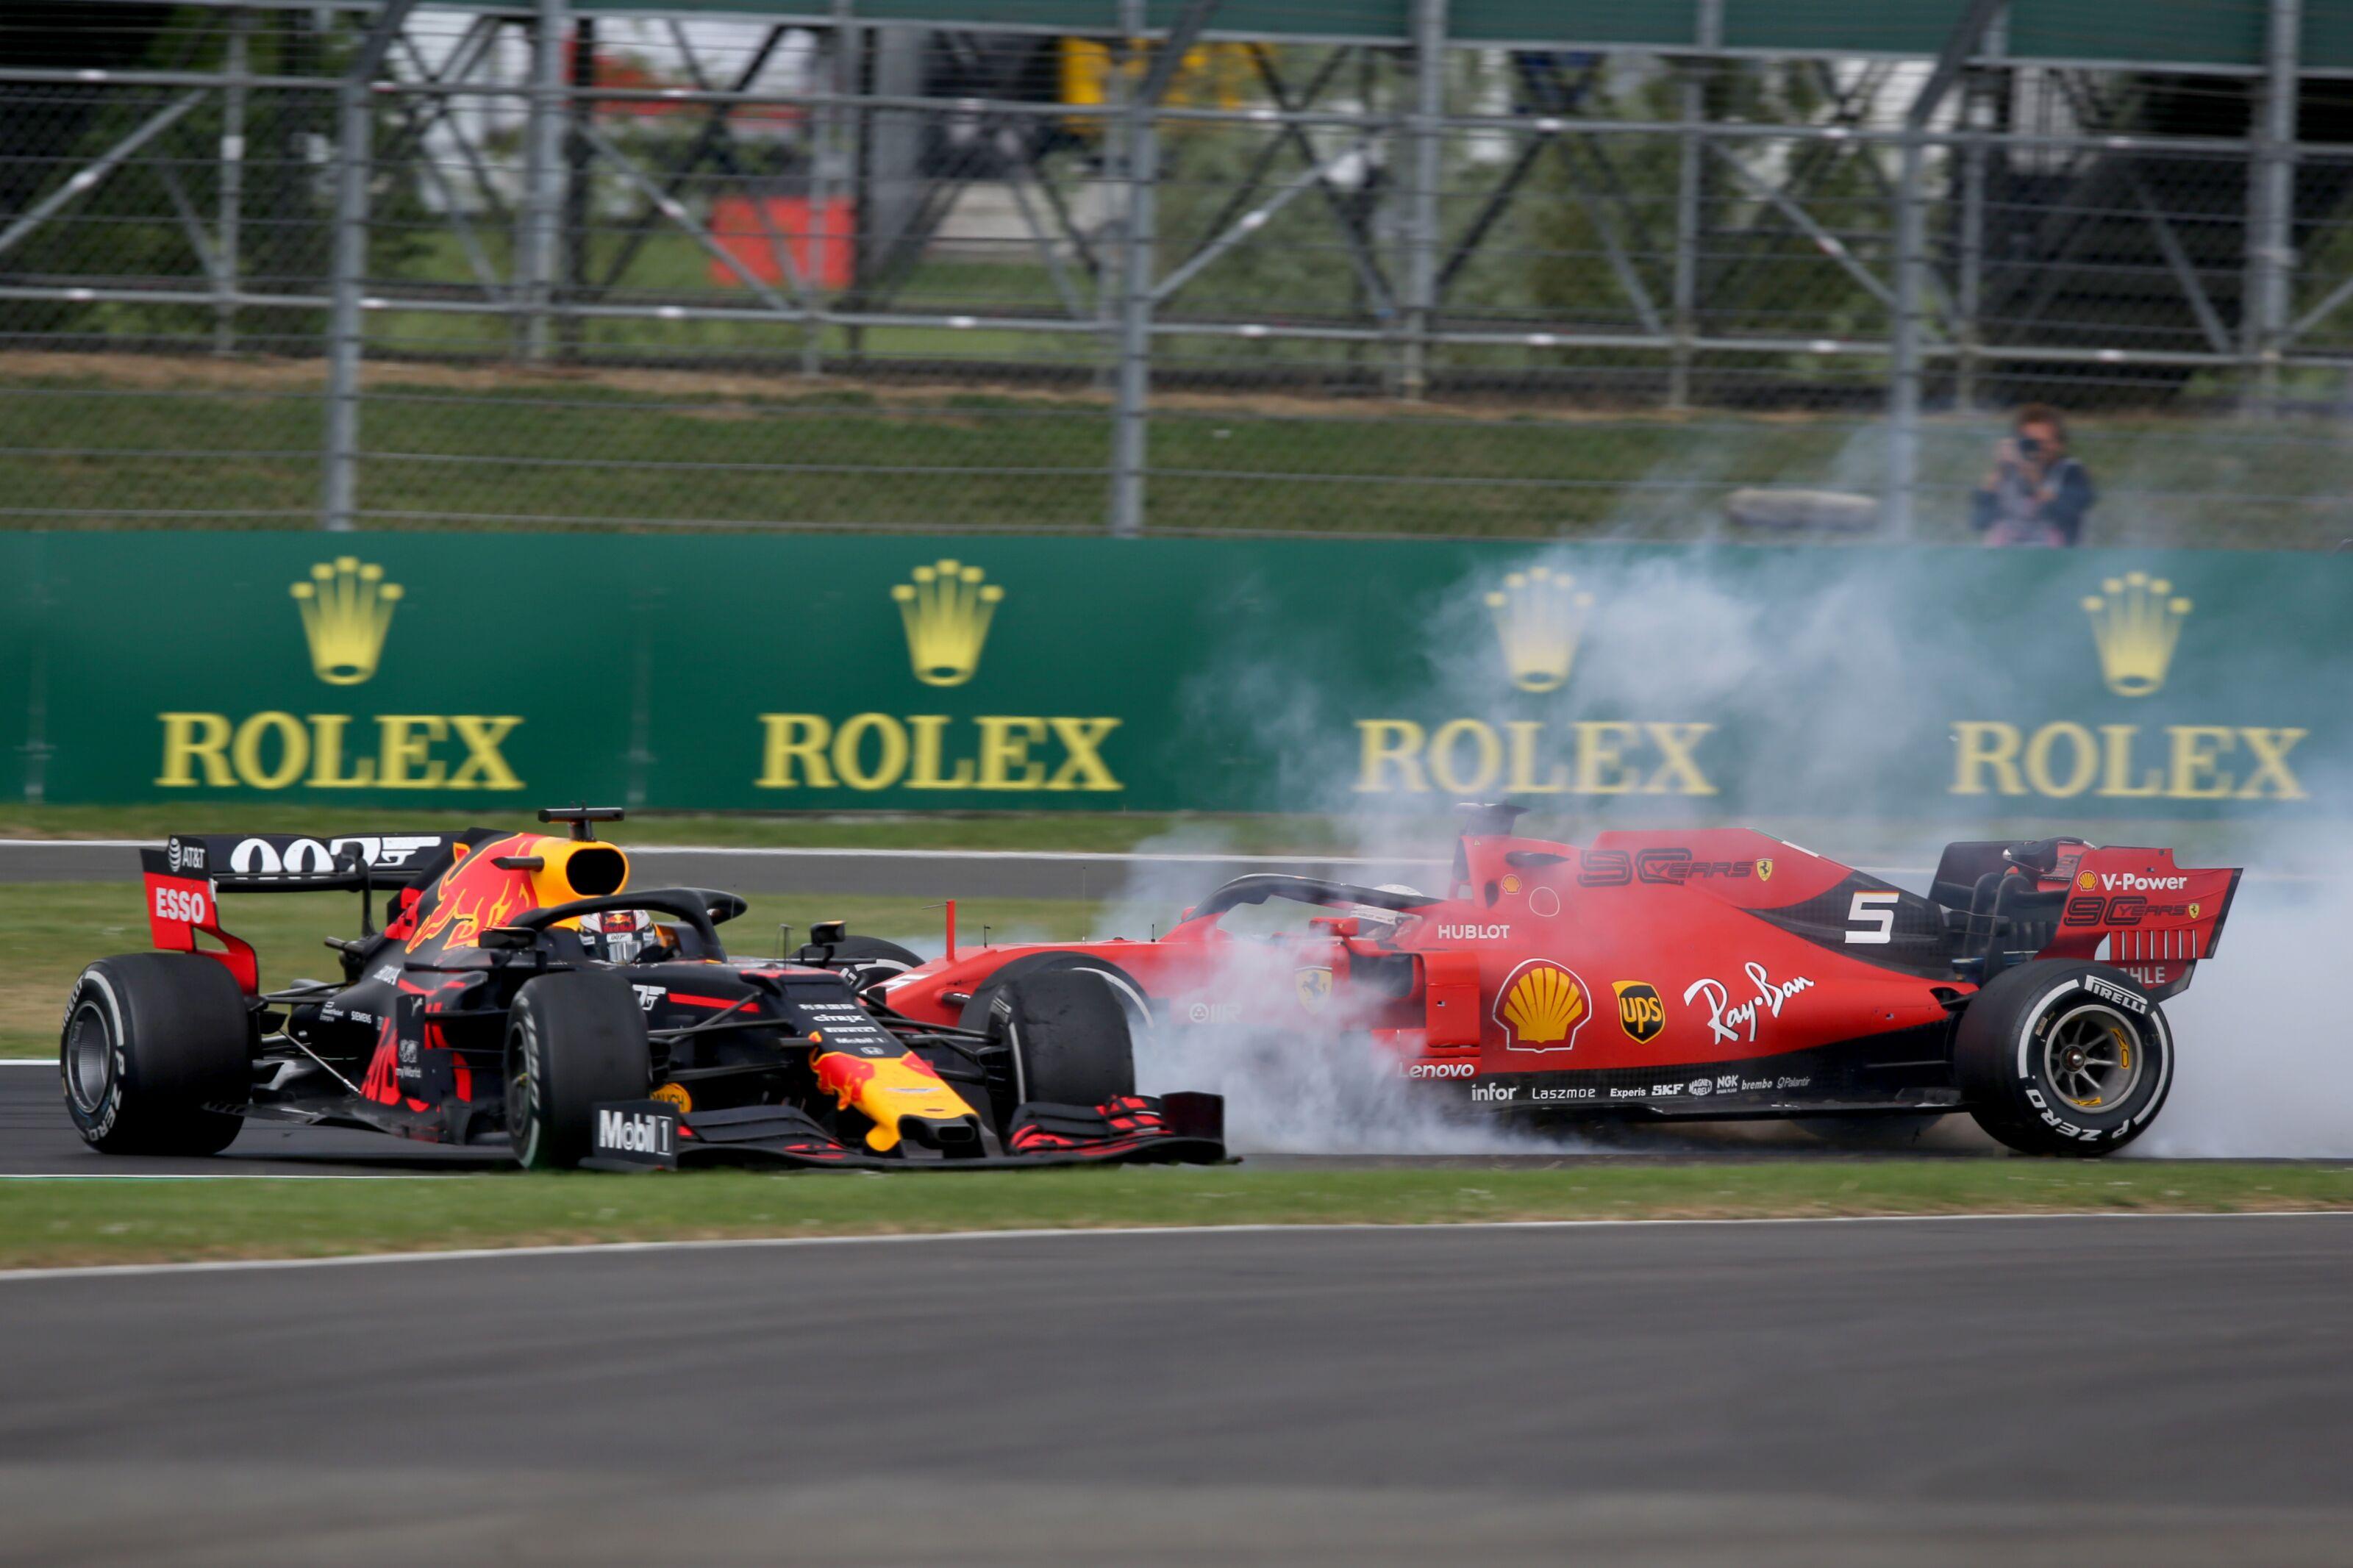 Formula 1: Sebastian Vettel's error-proneness has become unfathomable